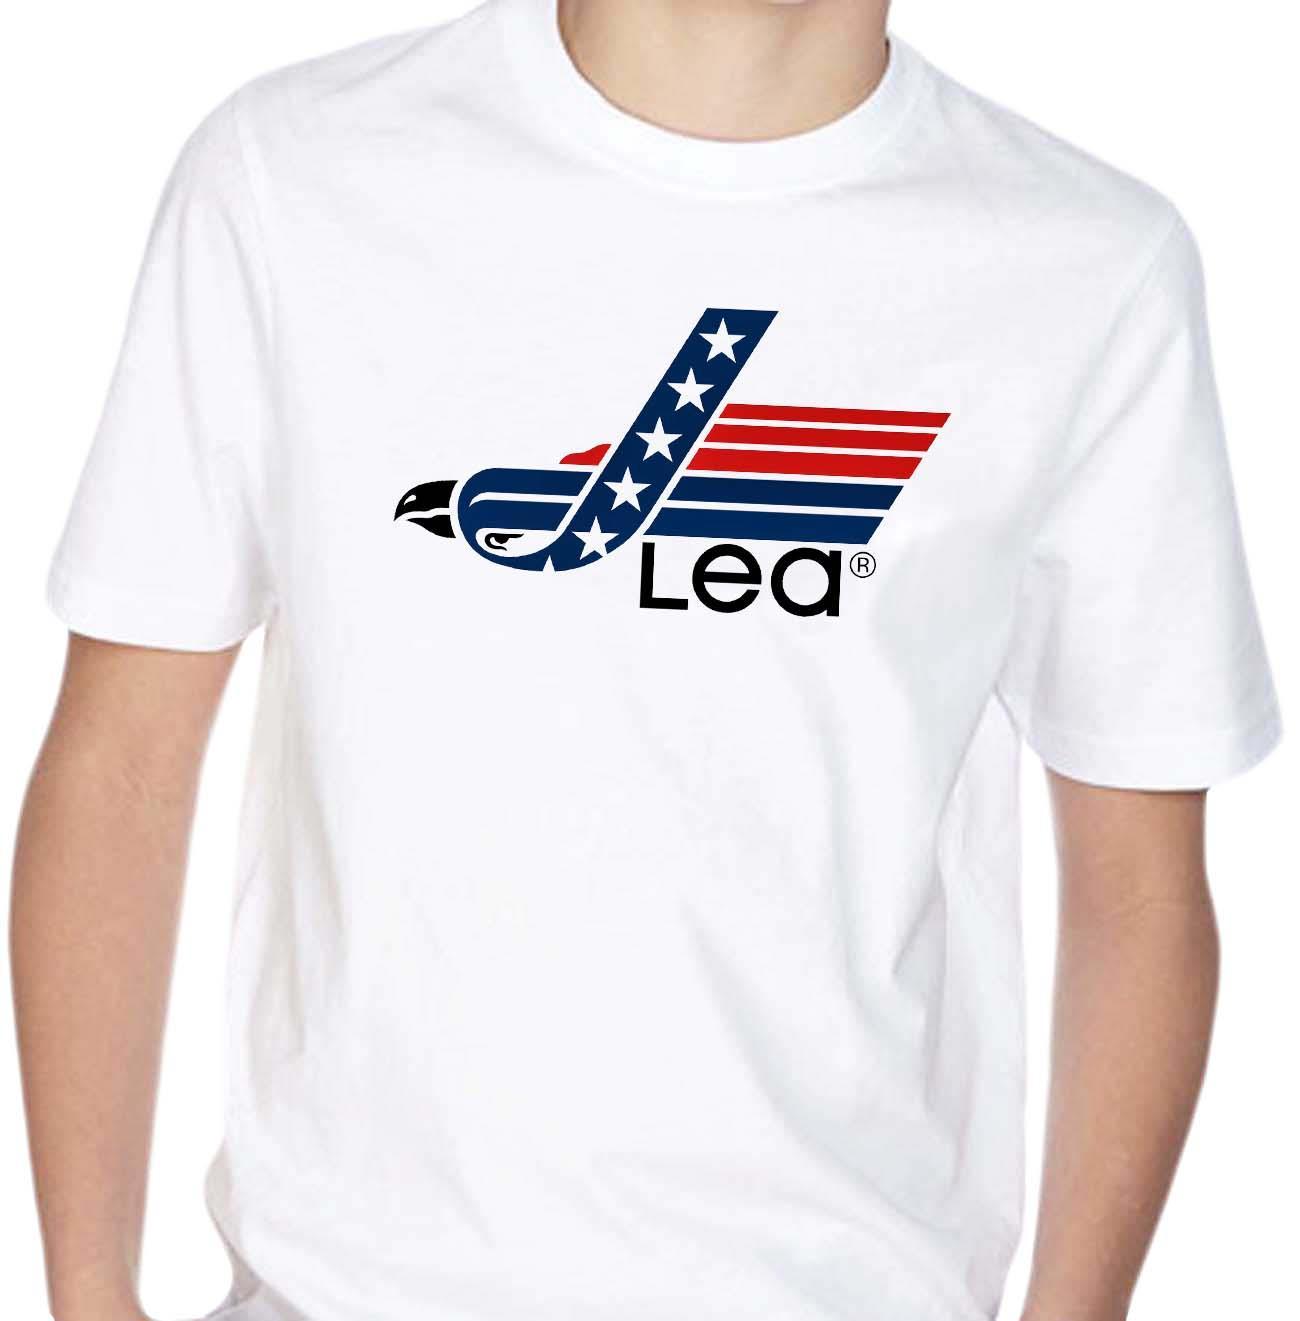 Kaos T-shirt Distro L006 Baju Kaos Pria   Wanita Bahan Catton 0b6411d785